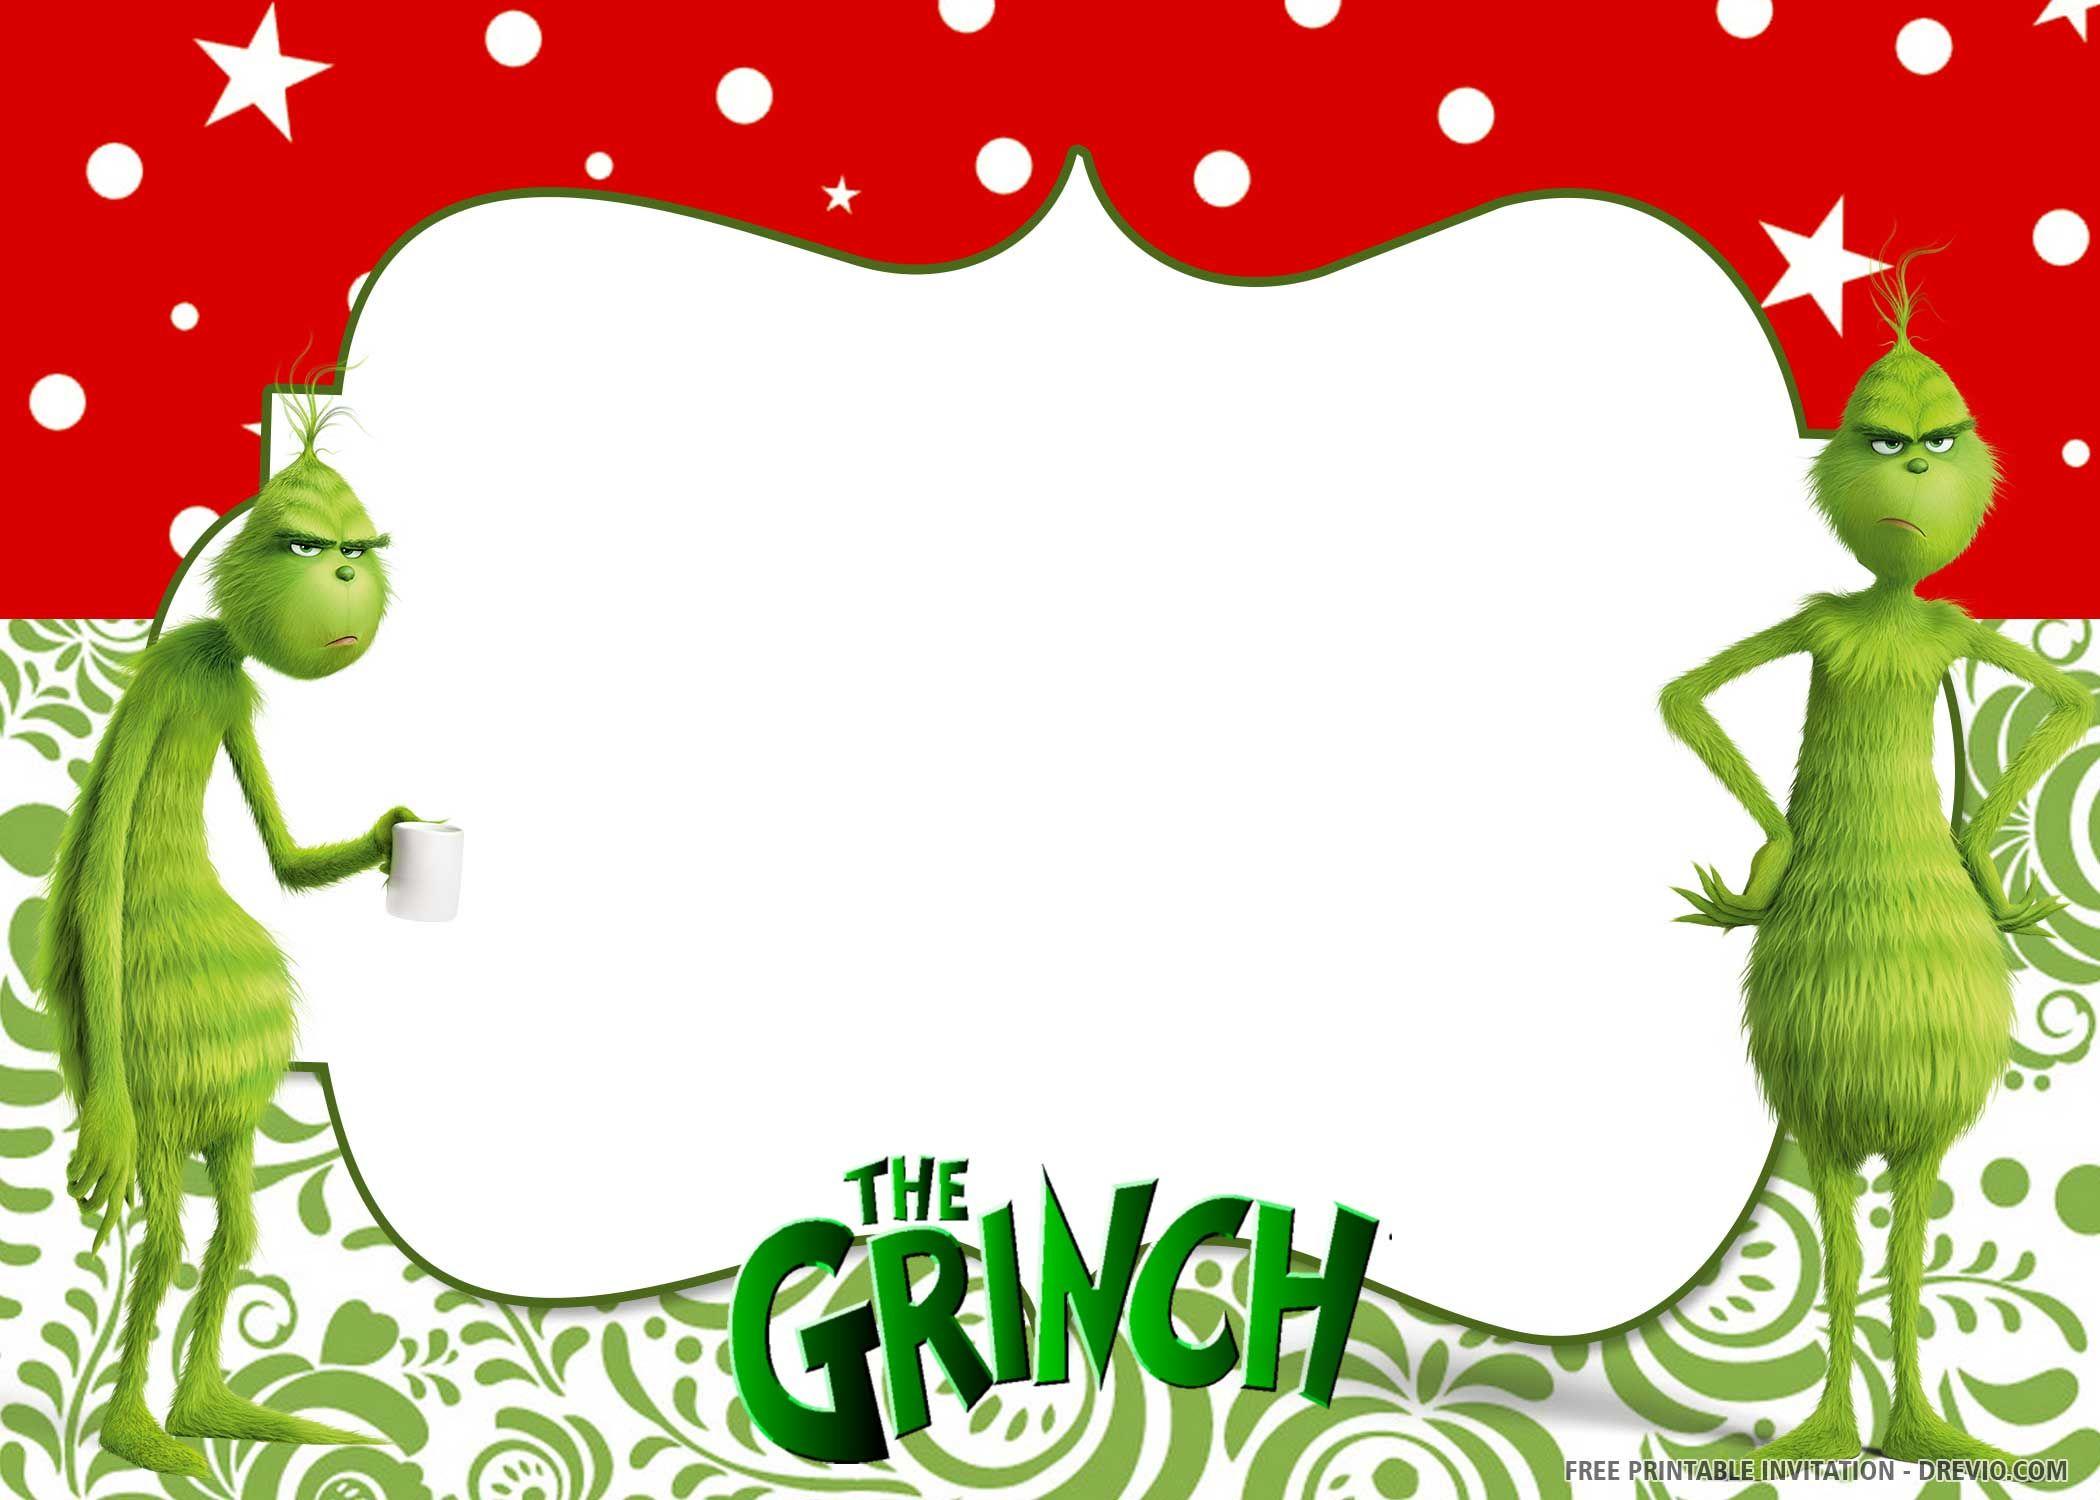 Free Printable Grinch Birthday Invitation Templates Christmas Party Invitation Template Christmas Invitations Template Birthday Invitation Templates